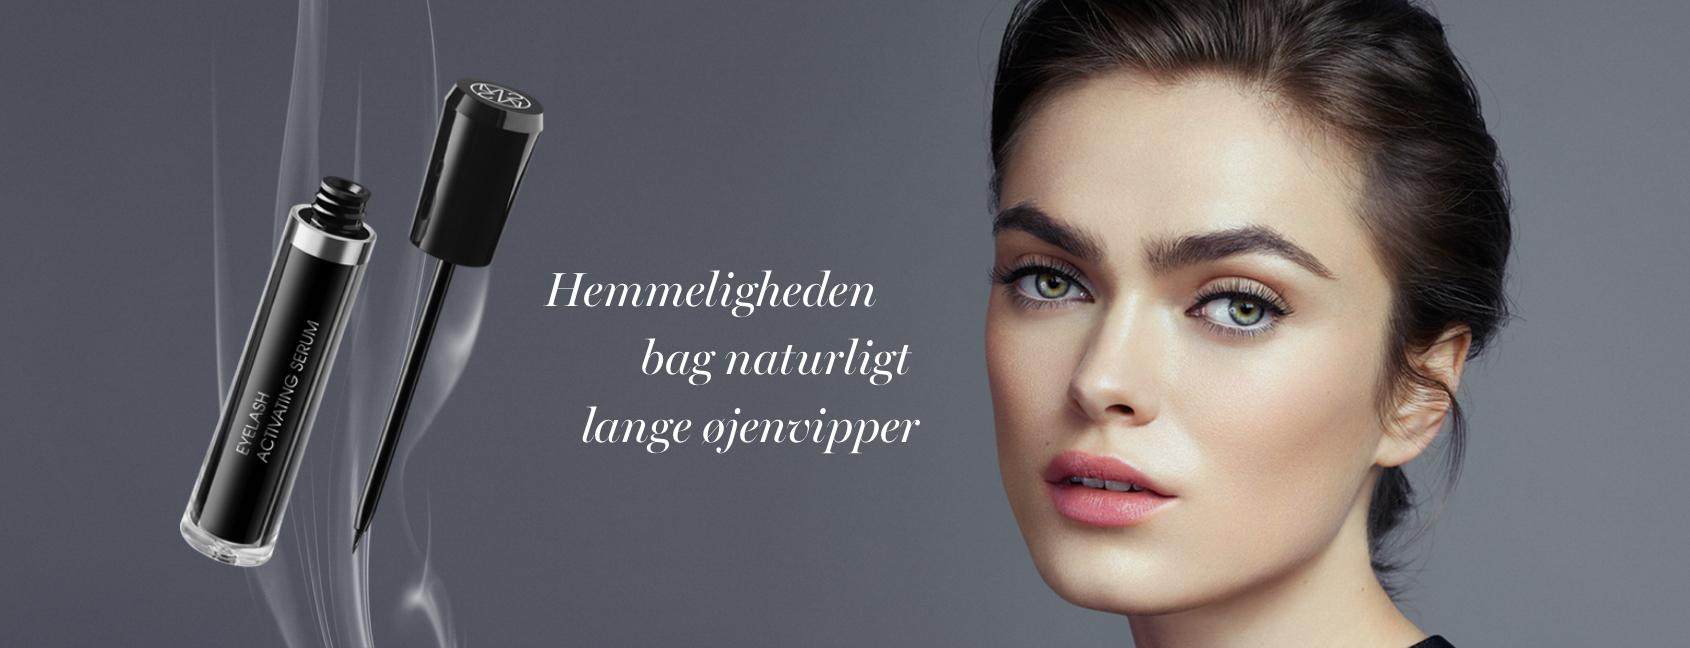 M2 Beauté eyelash activating serum hos Lykke & velvære i Helsingør Nordsjælland